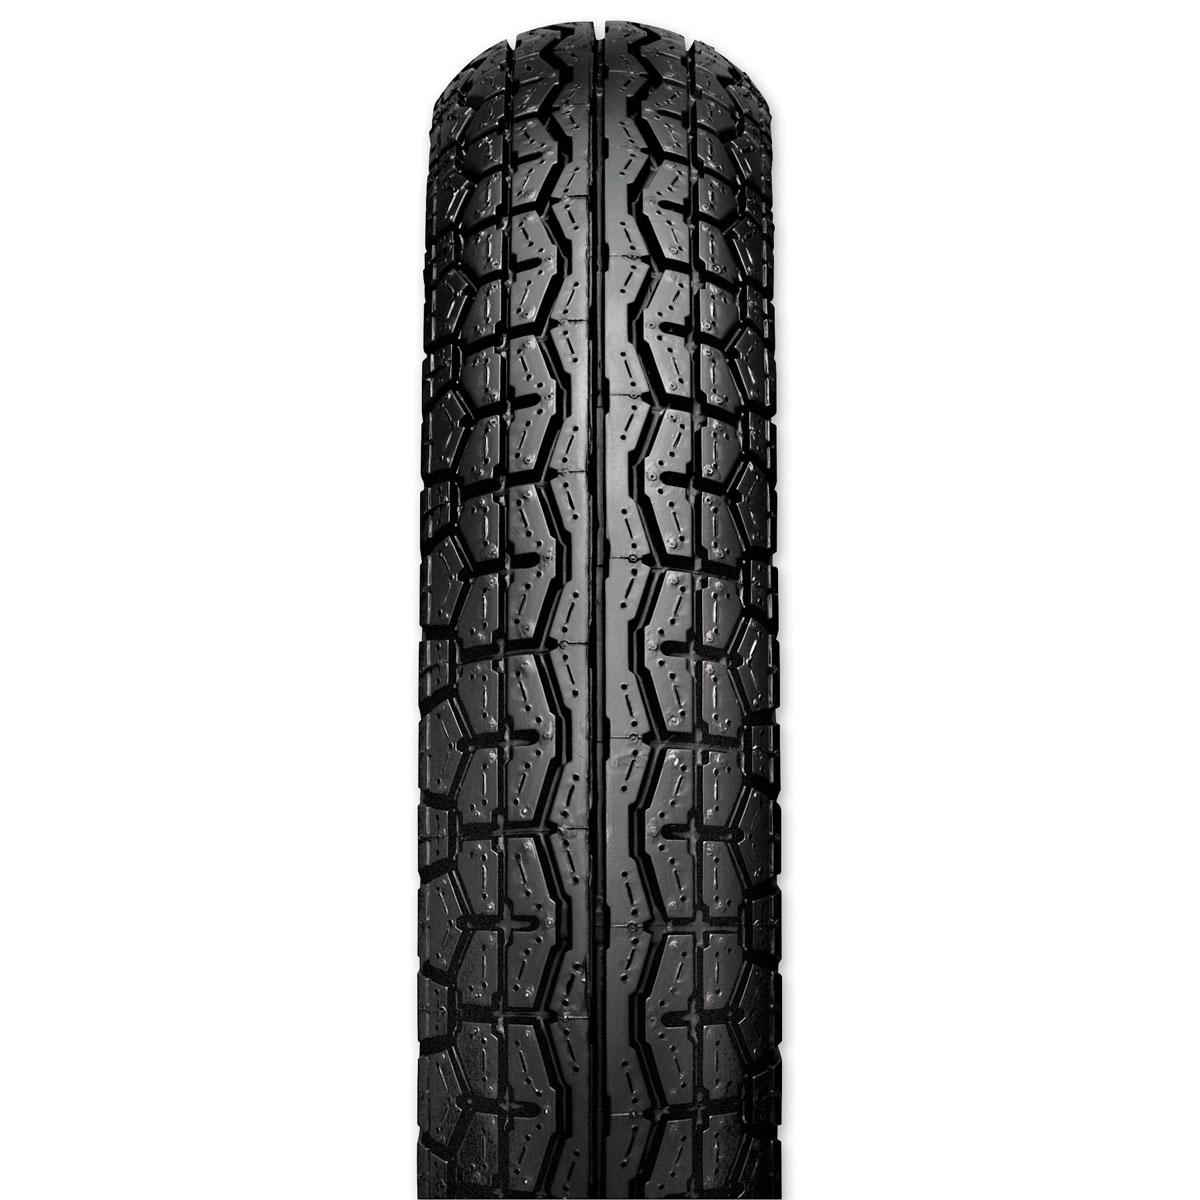 IRC GS11 4.60S16 Rear Tire